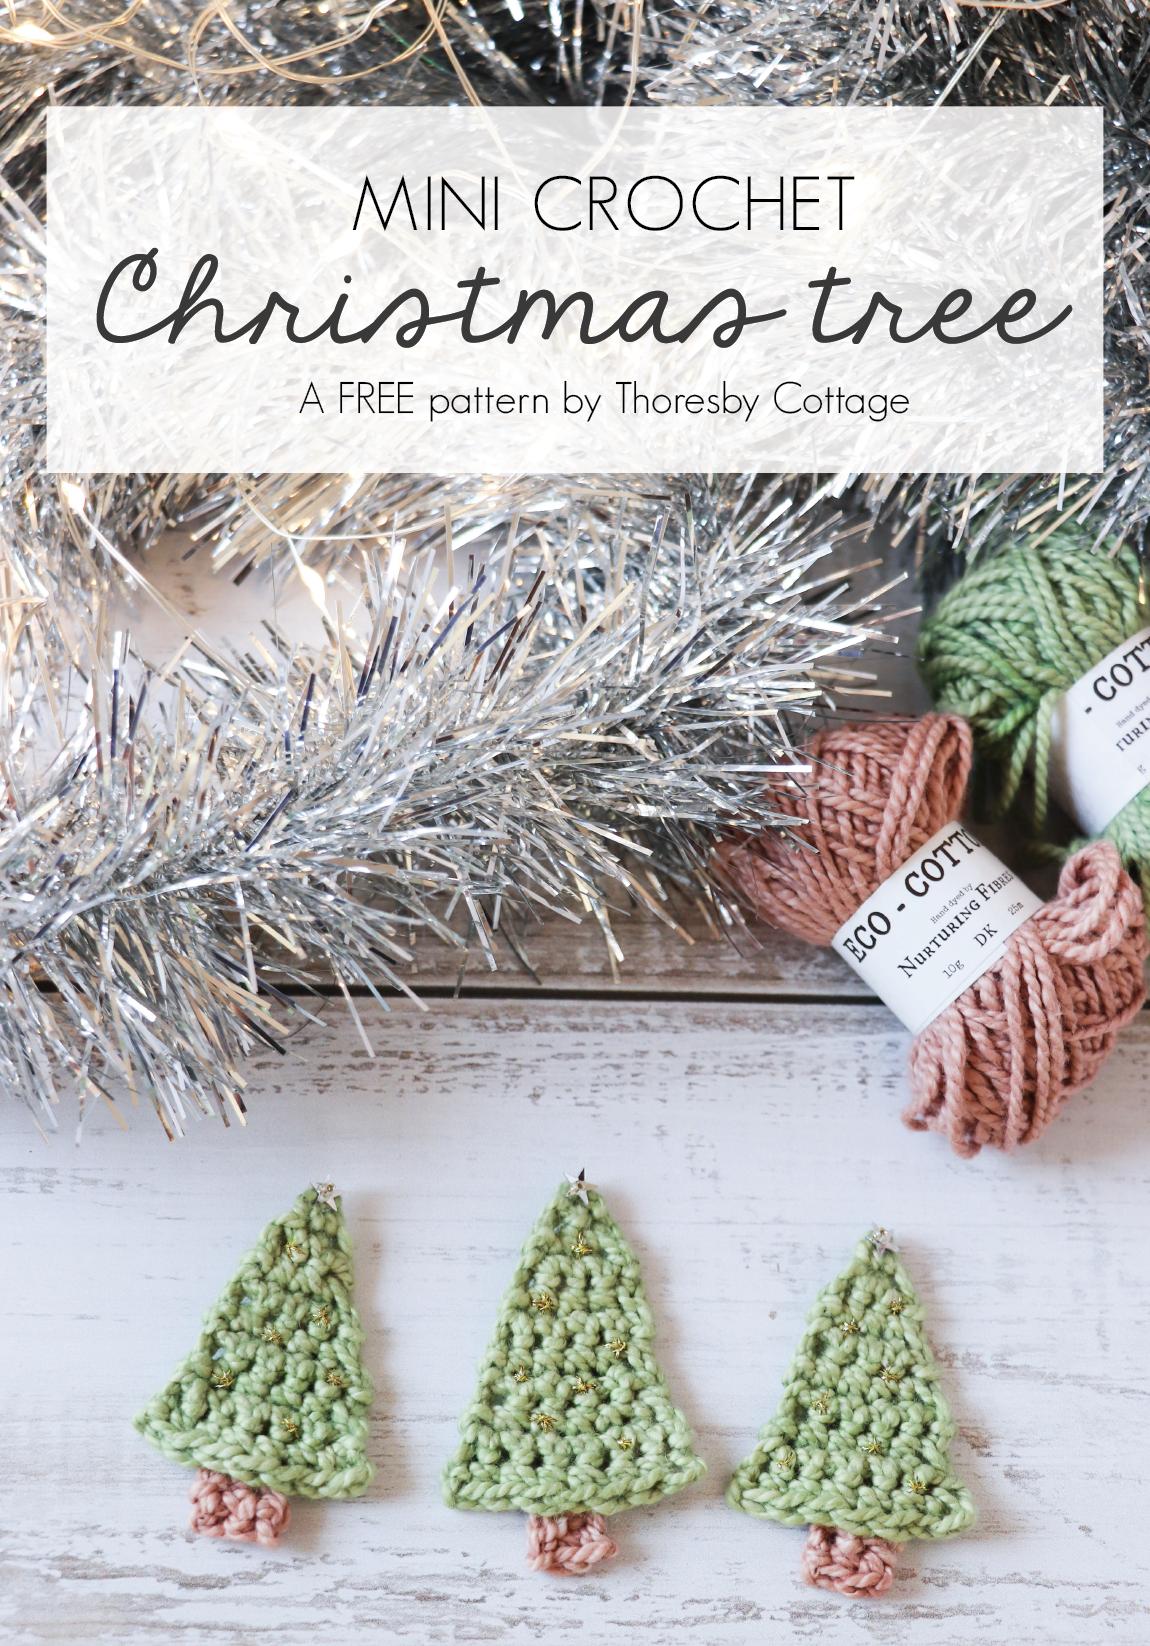 Mini Crochet Christmas Tree Free Pattern Thoresby Cottage Crochet Christmas Trees Ornaments Crochet Christmas Trees Free Crochet Xmas